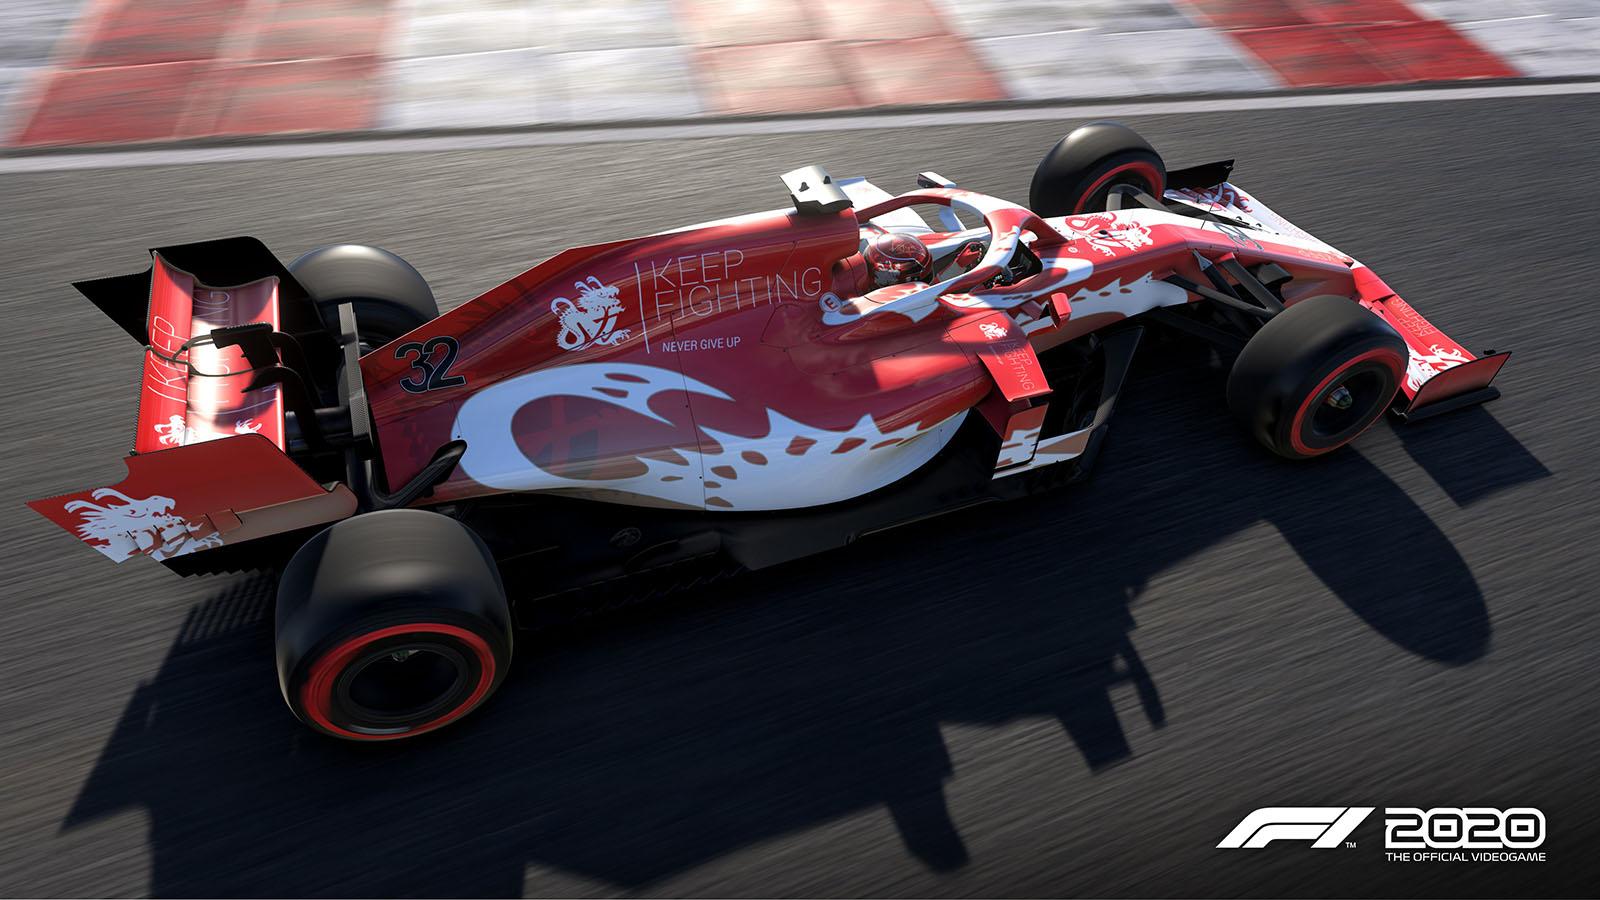 F1 2020 Patch Keep Fighting Foundation DLC